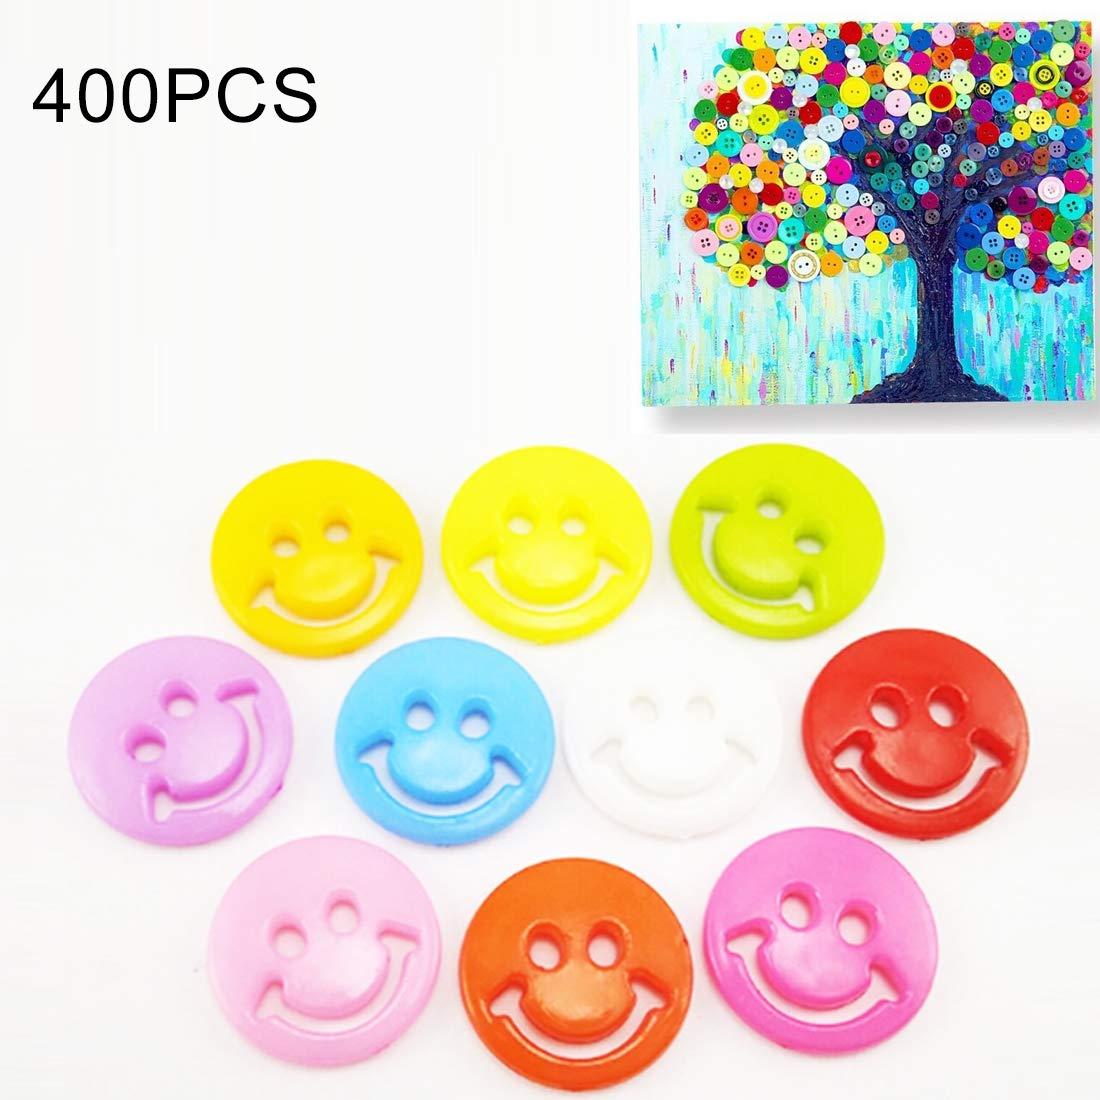 Tangyongjiao Home Decorative Supplies 400 PCS Smile Face Resin Children Sweater Buttons Sewing Buttons in Bulk, Random Color, Diameter: 12.5mm by Tangyongjiao